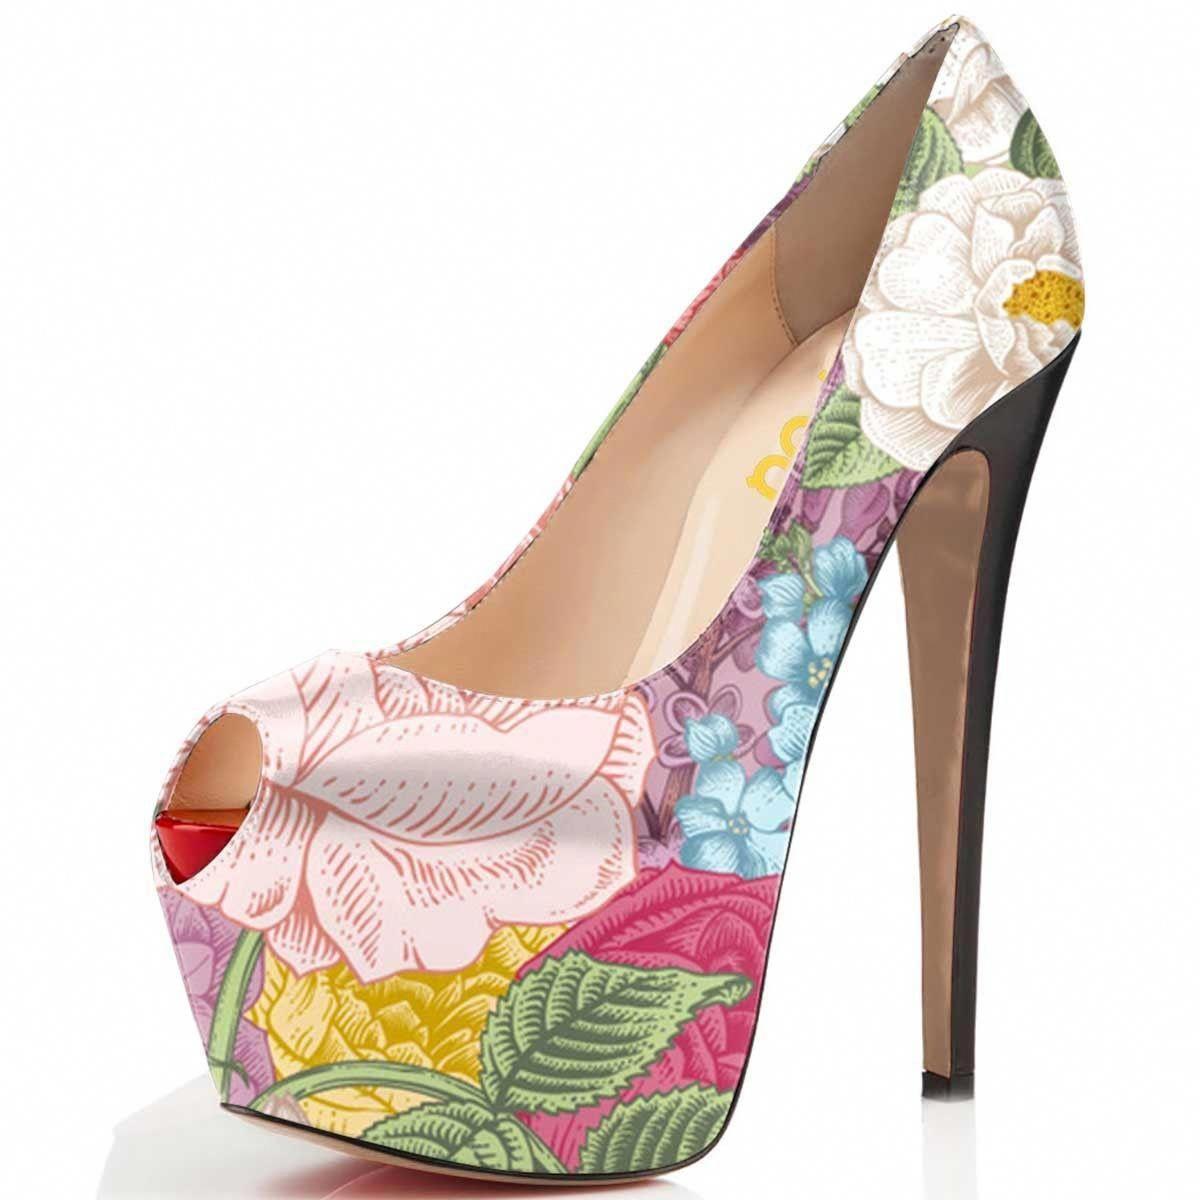 df41da2407e Floral peep toe pump heels platform pump stiletto heels fall outfits   Platformpumps